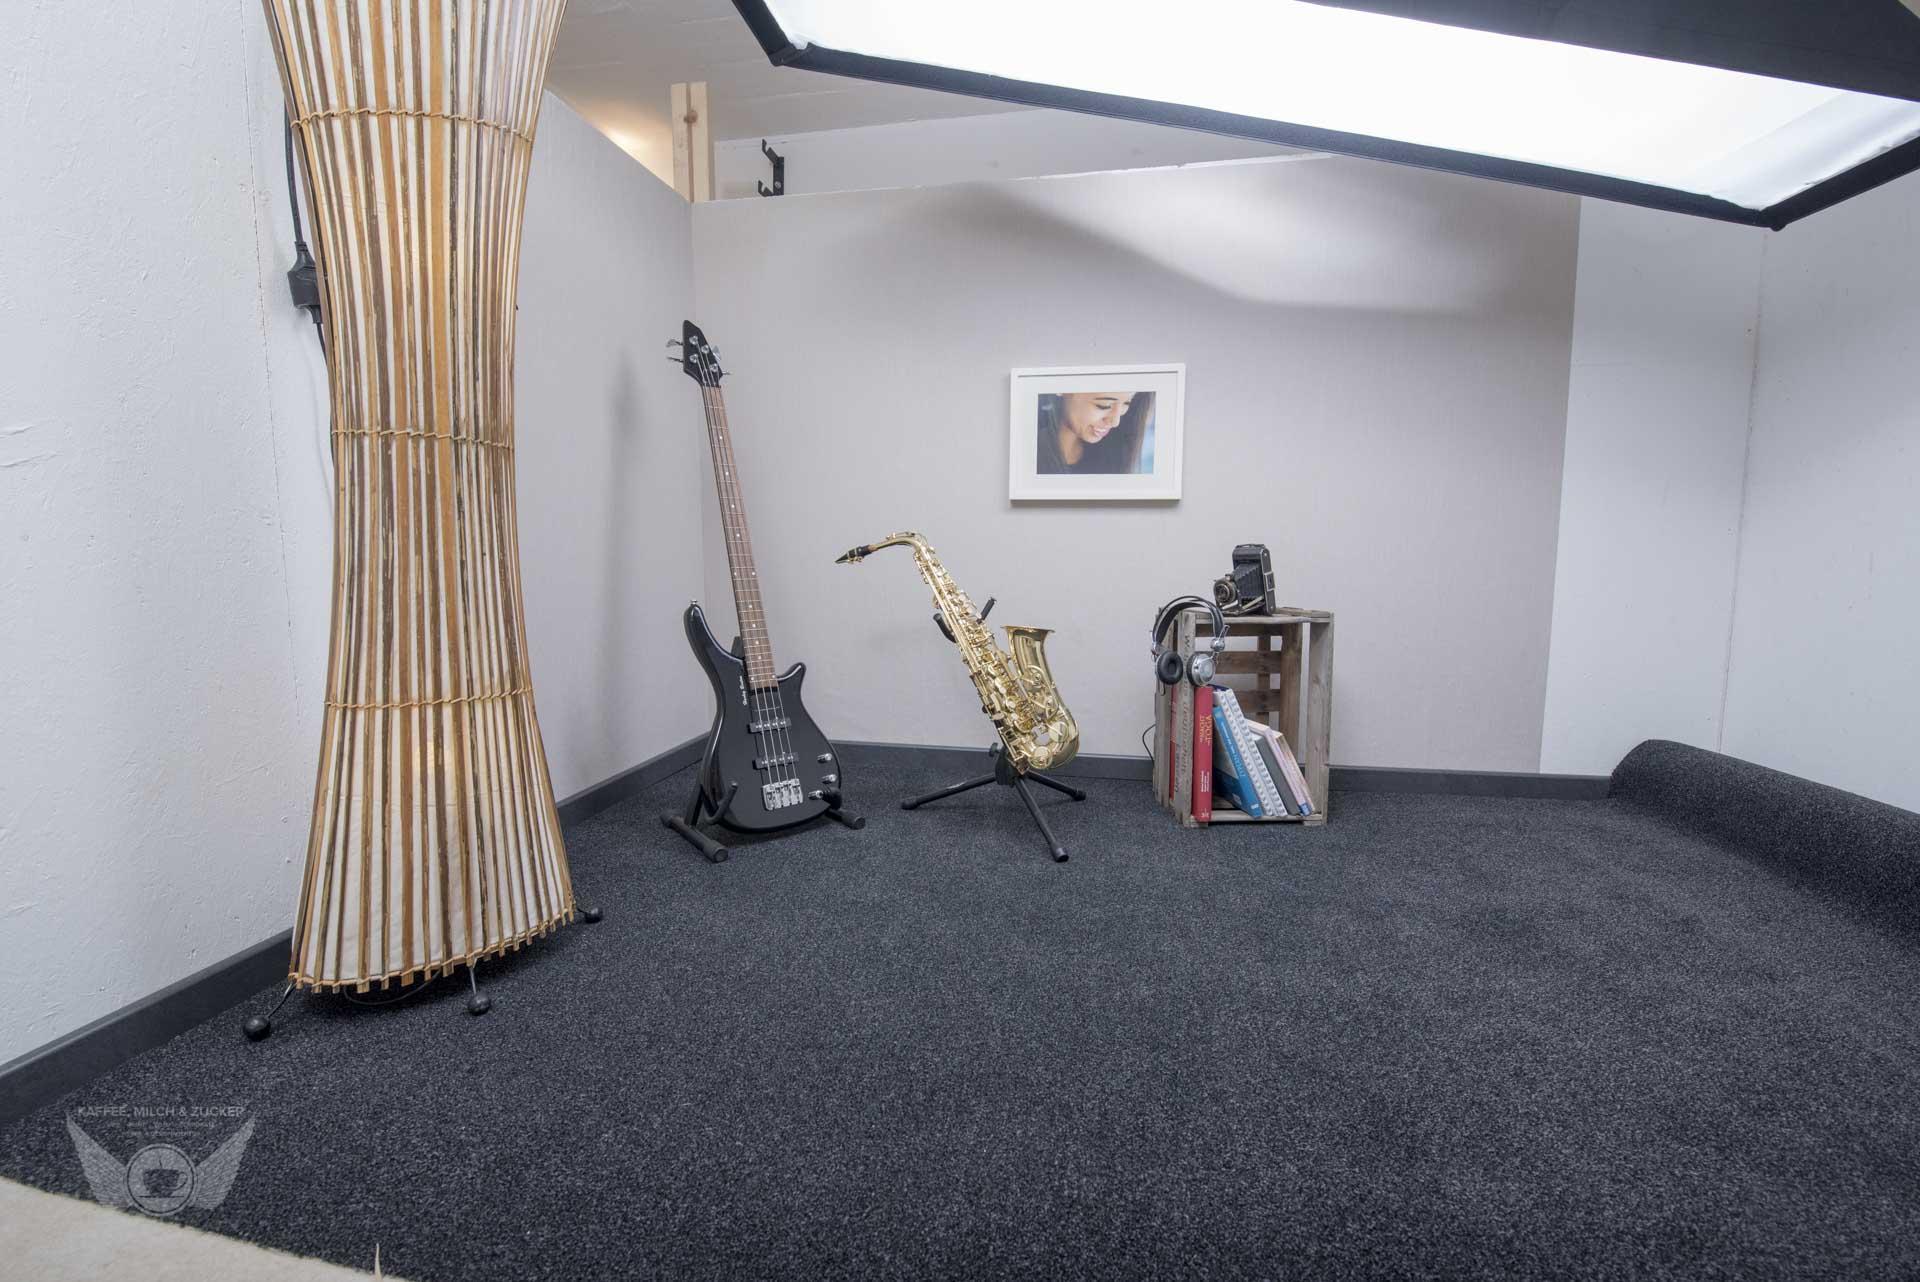 fotoaufnahmen f r fibo exclay kaffee milch zucker. Black Bedroom Furniture Sets. Home Design Ideas